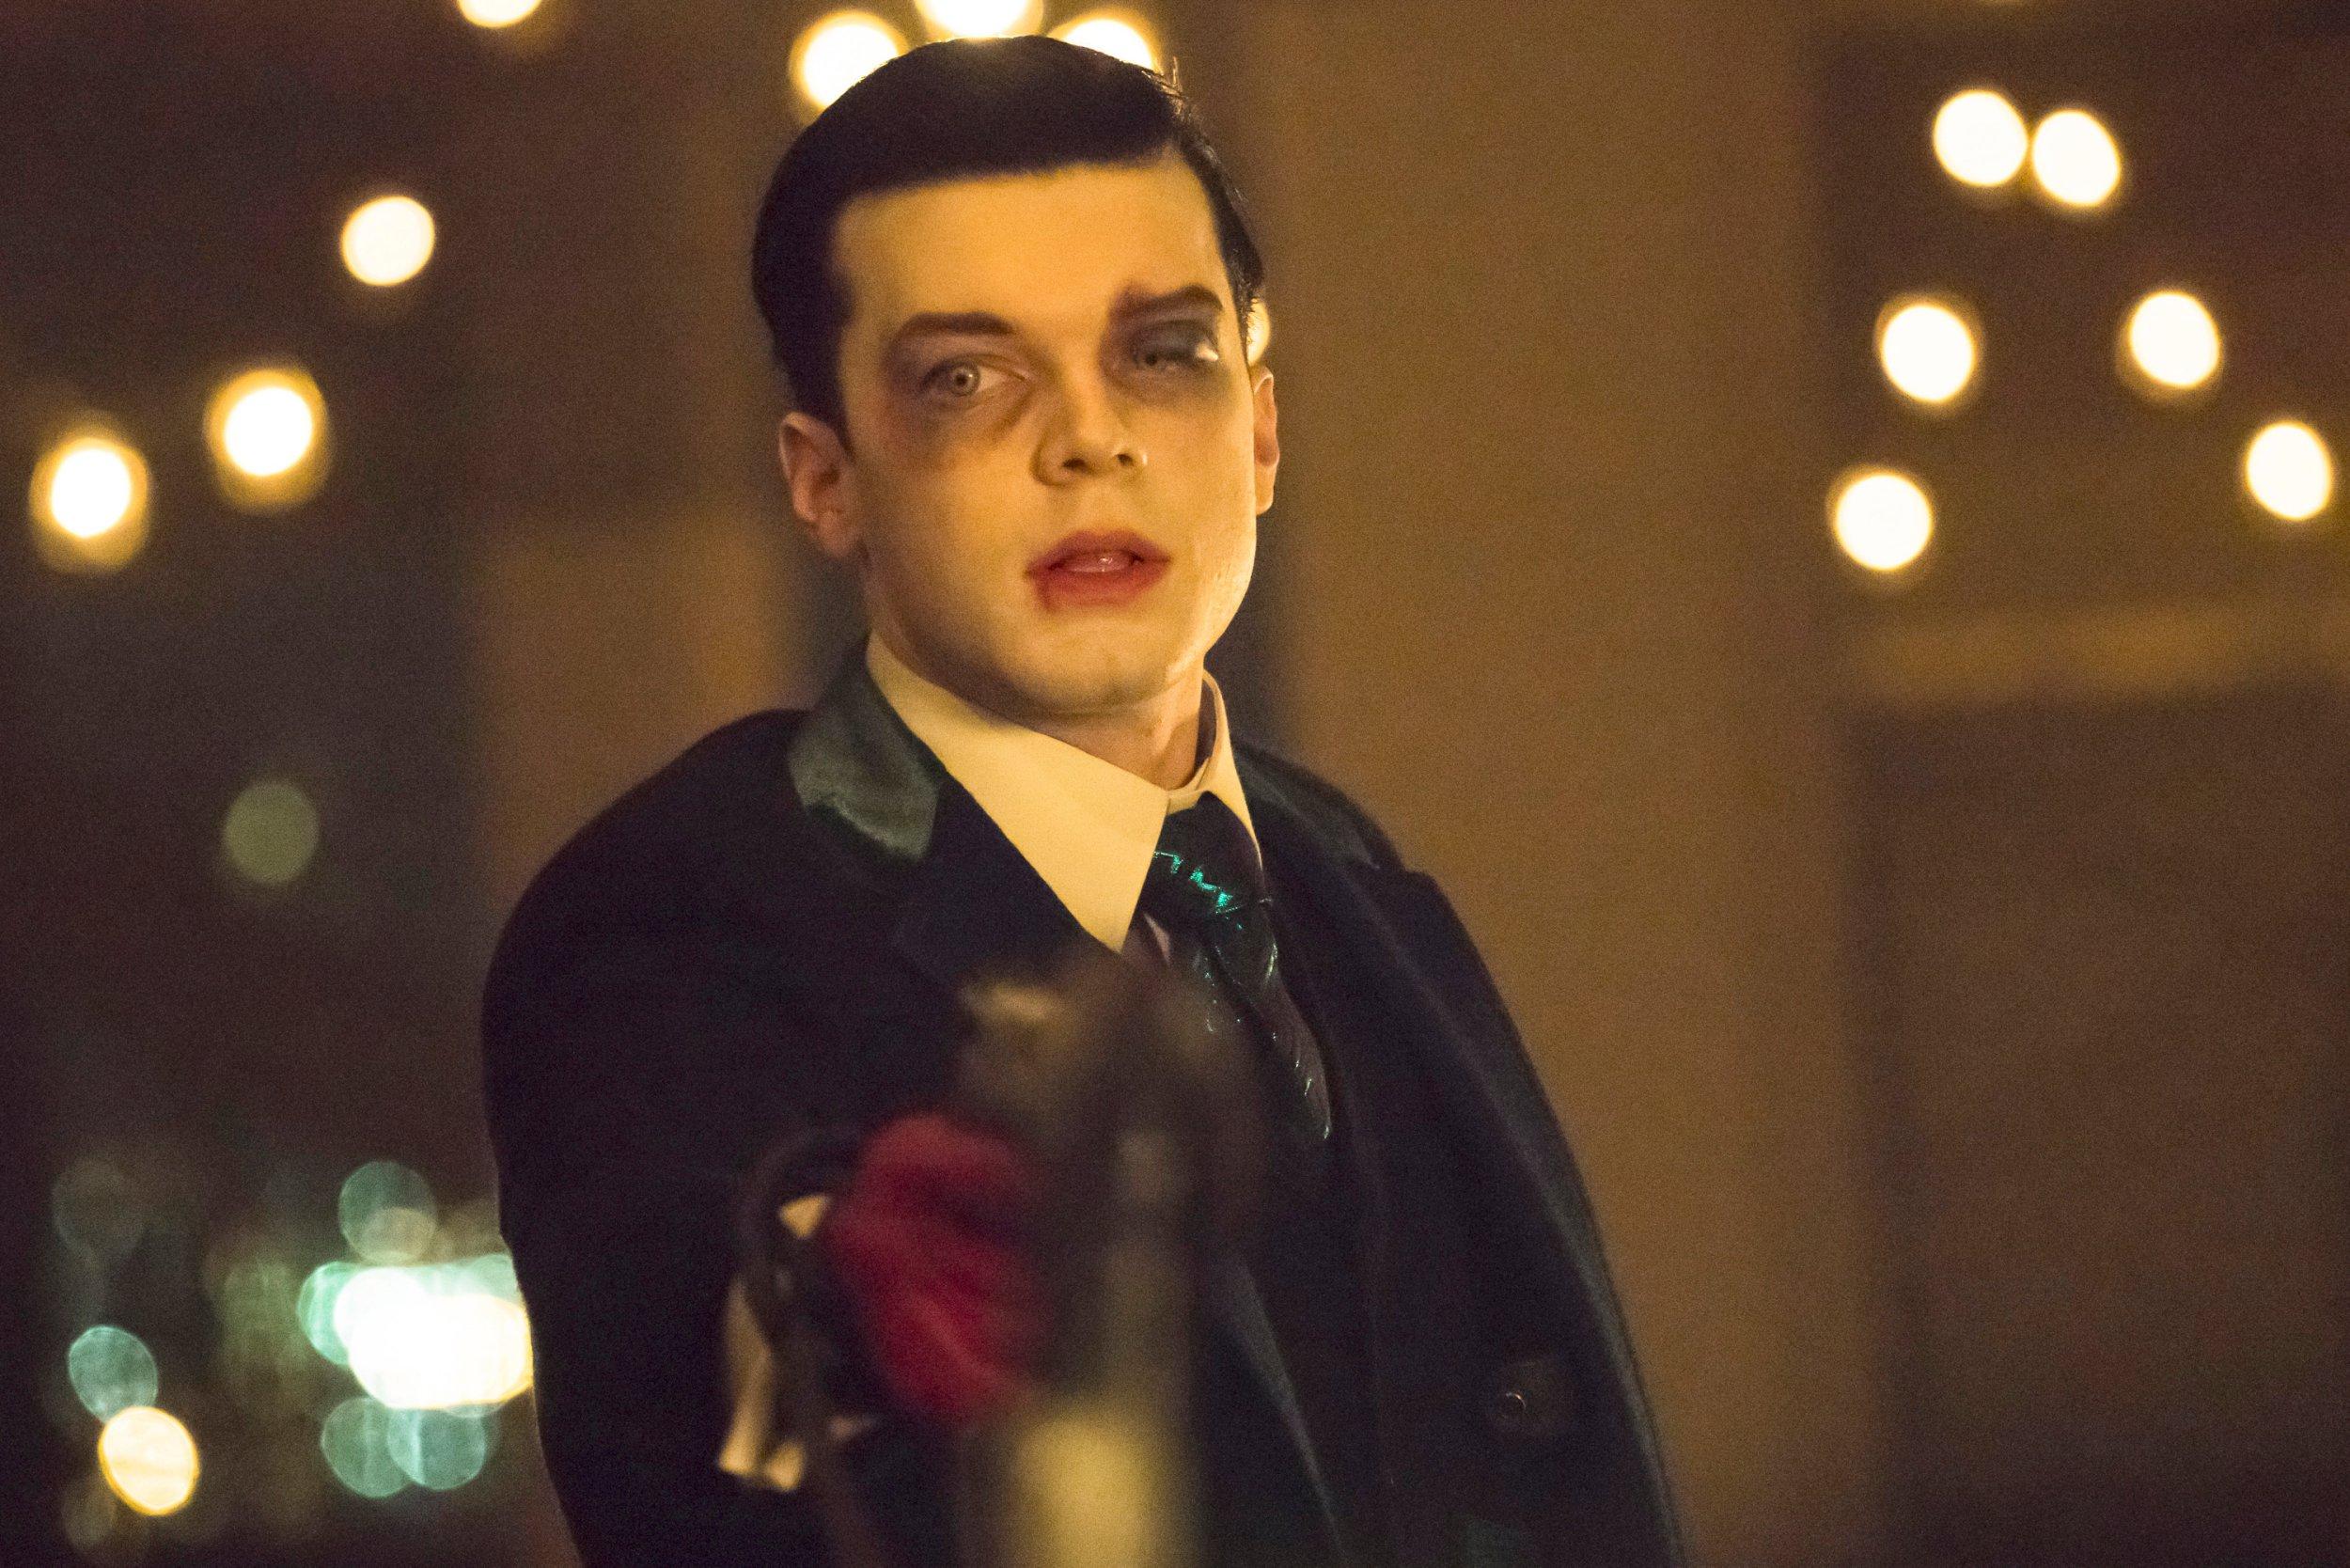 Gotham's final season finally explains the Joker's origin story after Ace Chemicals showdown